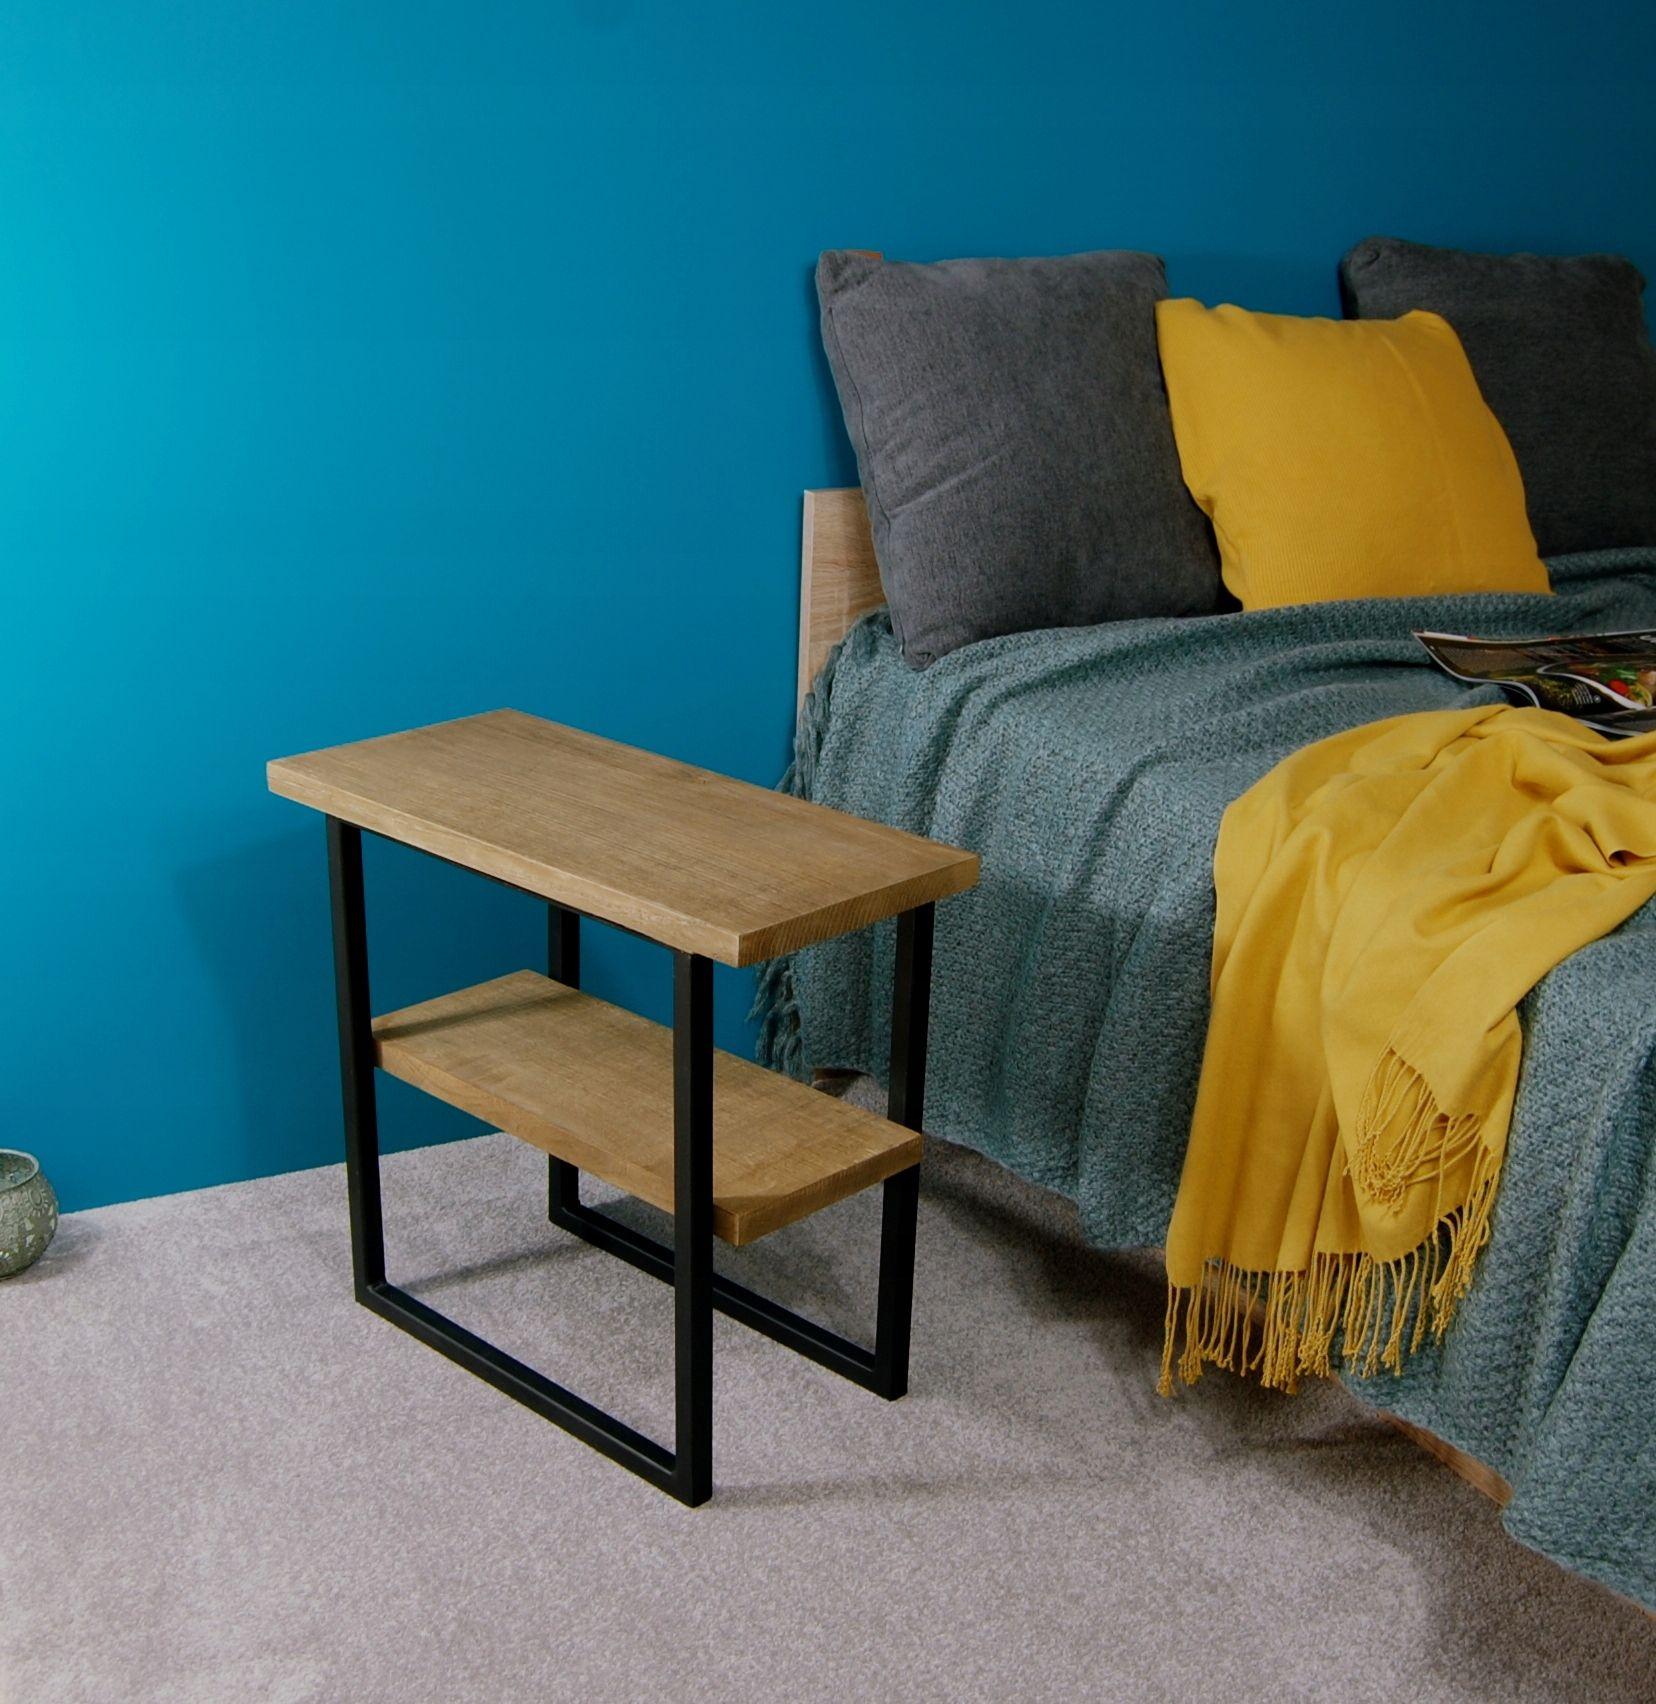 Stolik Nocny Dab Rustykalny K13th 7493899344 Oficjalne Archiwum Allegro Bedside Table Metal Coffee Table Home Decor